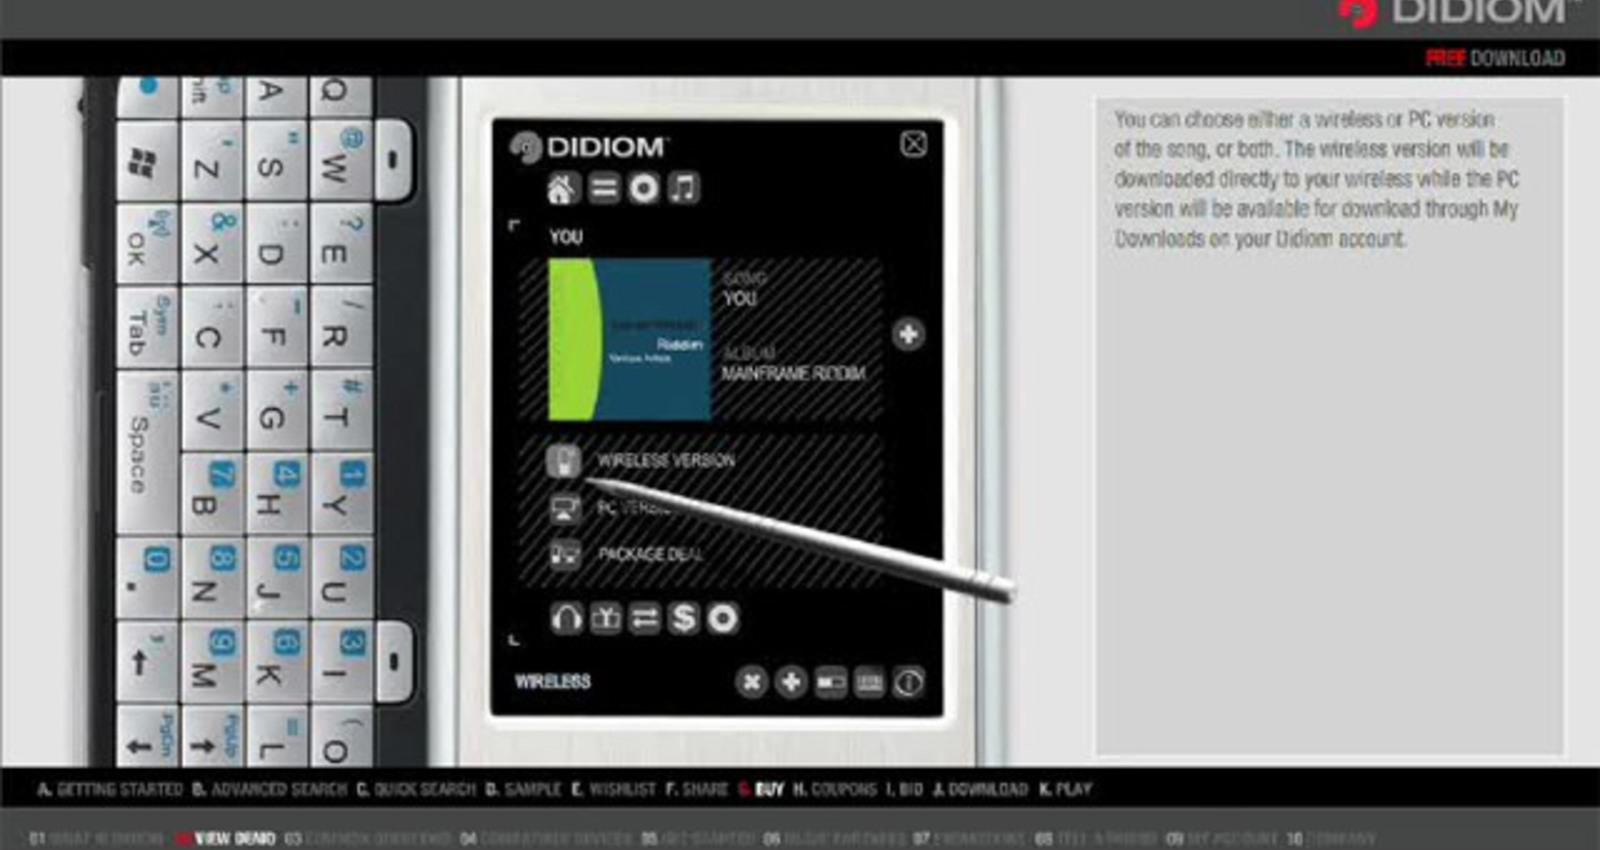 Didiom - Mobile Music Marketplace